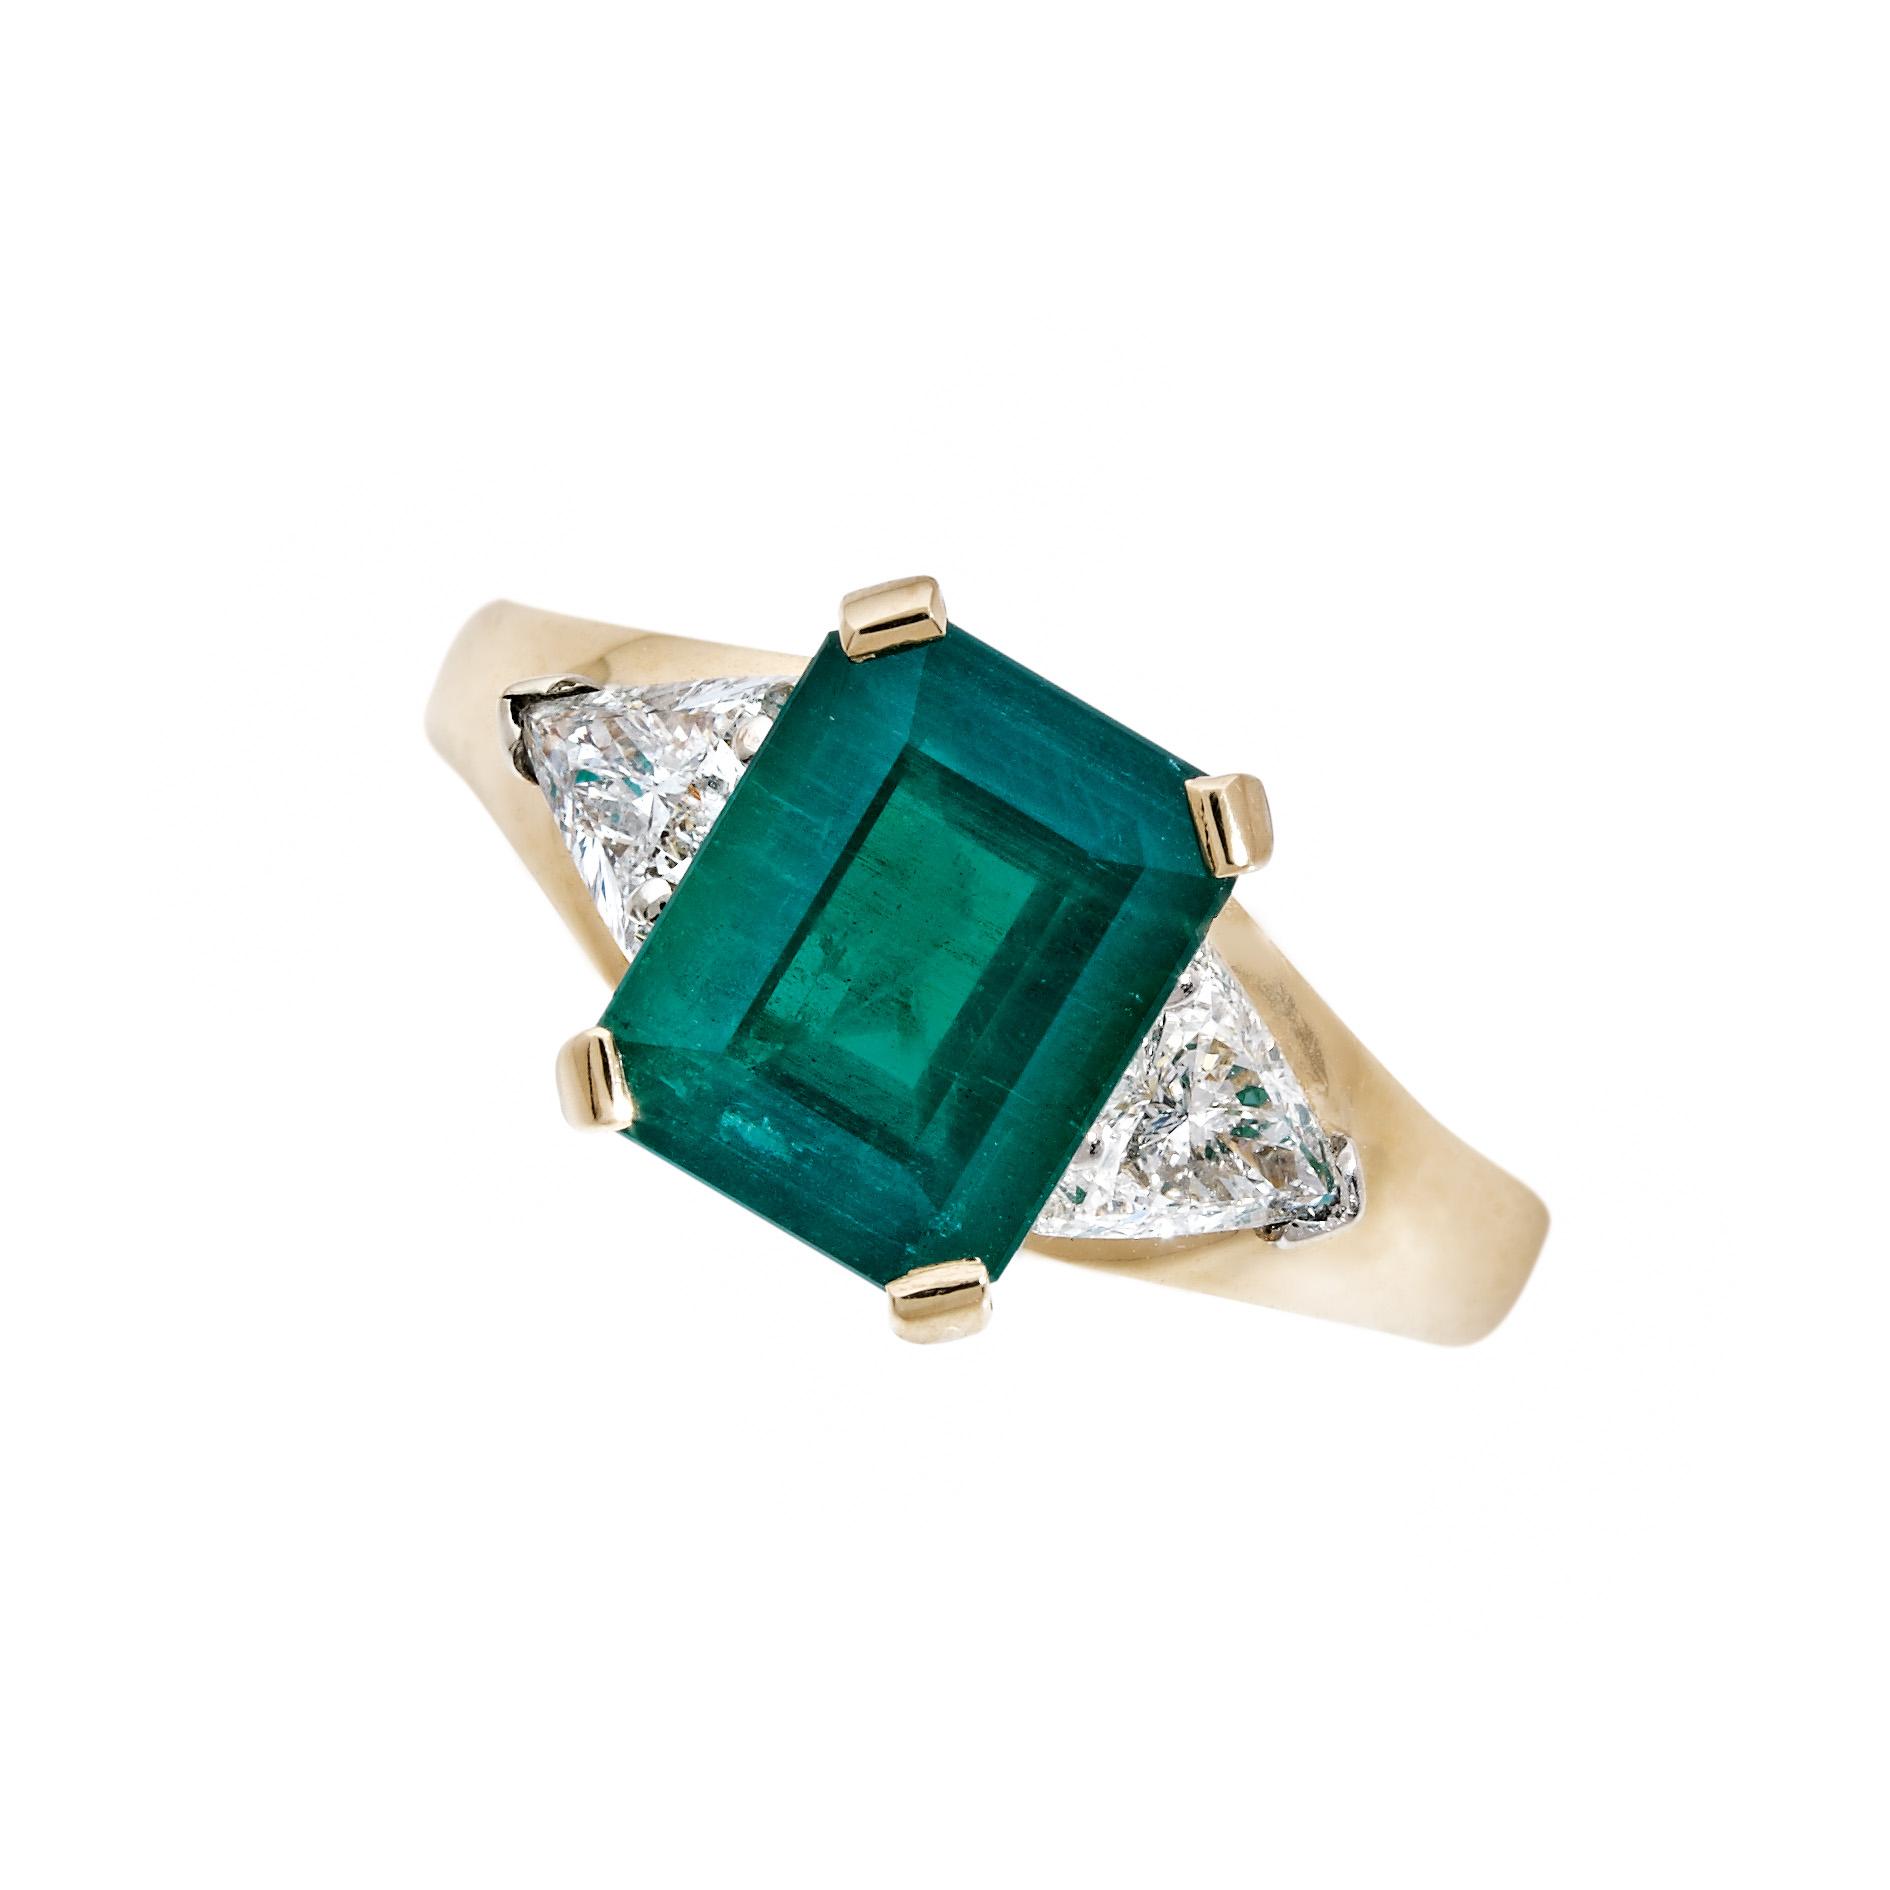 Bague Émeraude et Diamants - Pascal IZERN